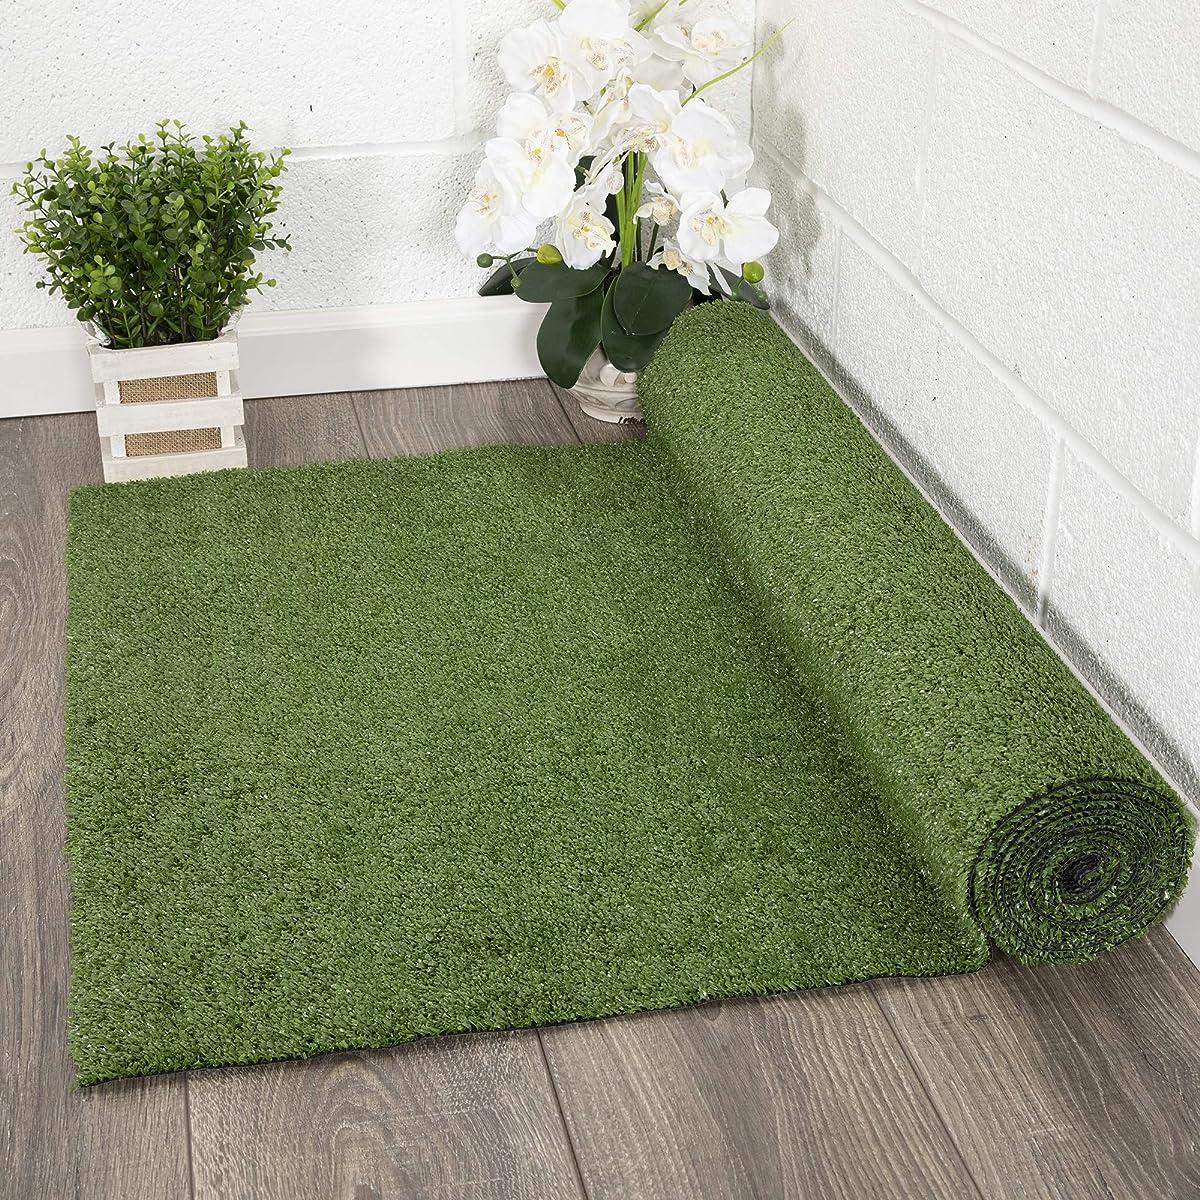 "Ottomanson Evergreen Collection Indoor/Outdoor Green Artificial Grass Turf Solid Design Runner Rug, 27"" x 8"